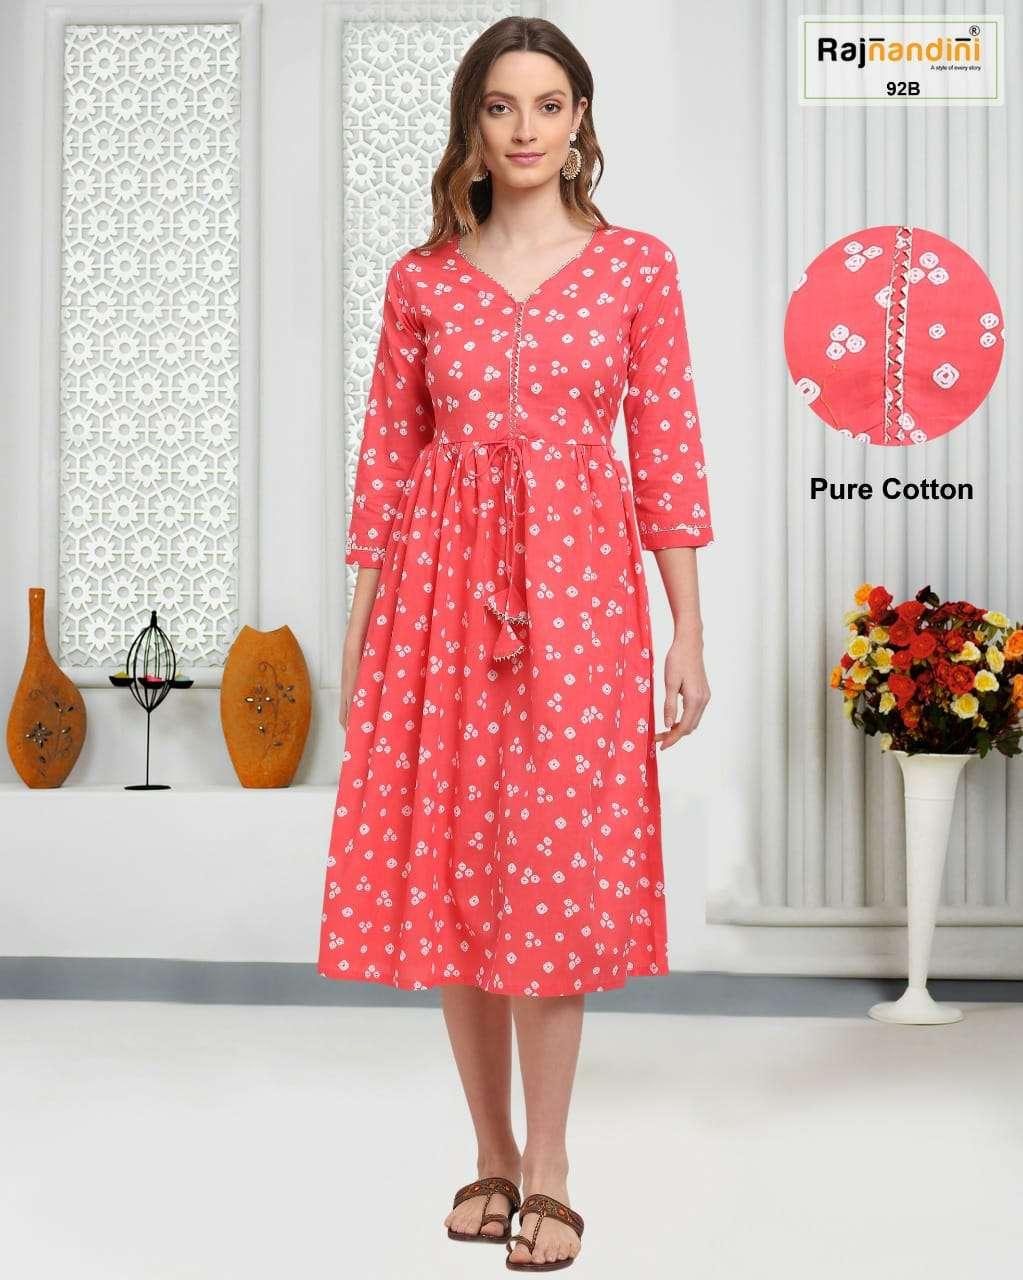 Rajnandini Vol 30 Printed Regular Wear Readymade Kurti New Designs